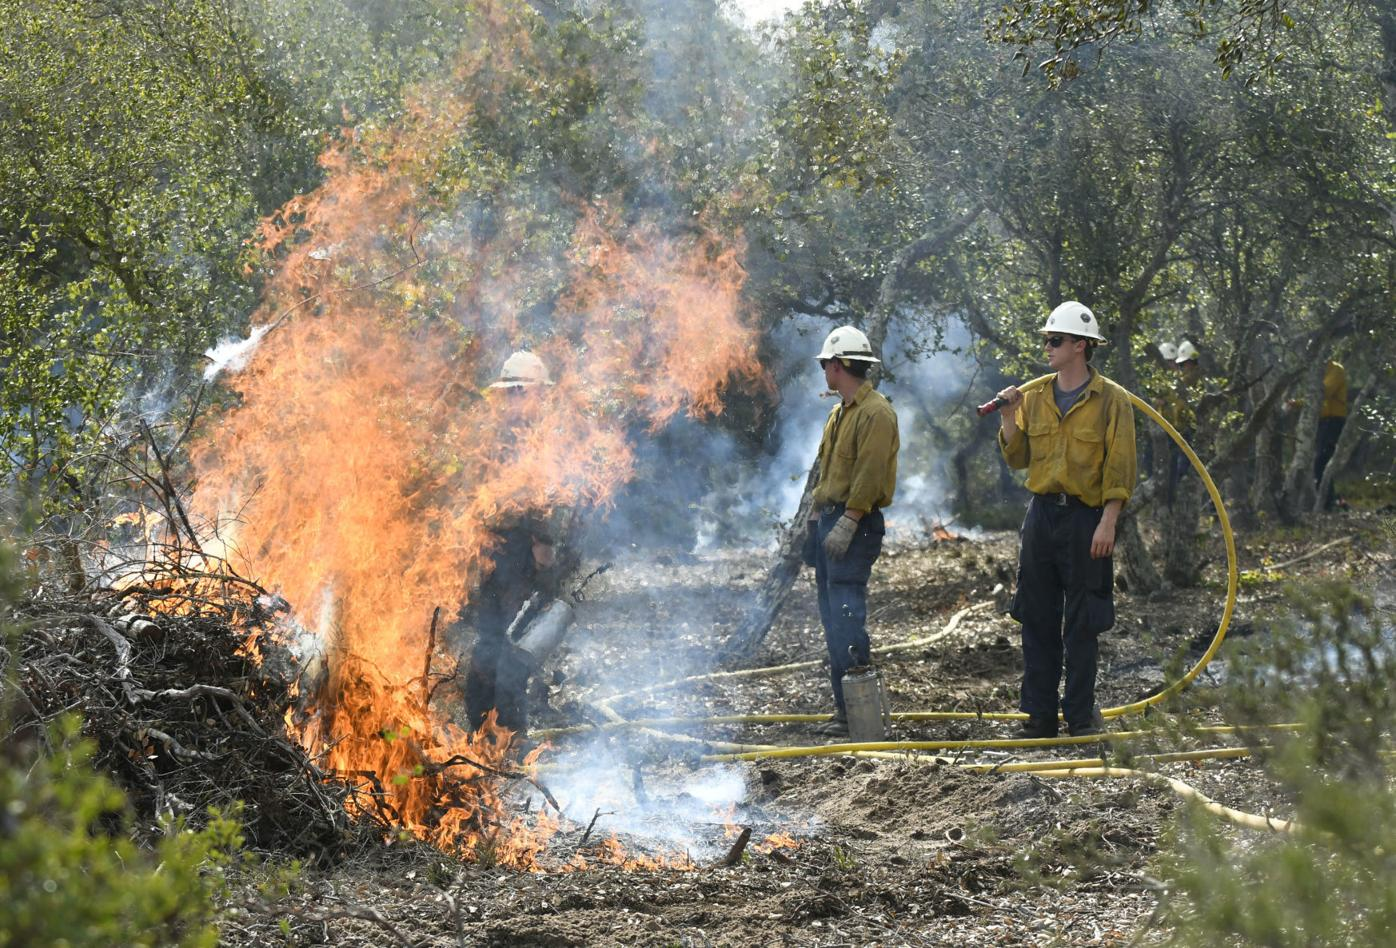 022619 Burton Mesa burn piles 03.jpg